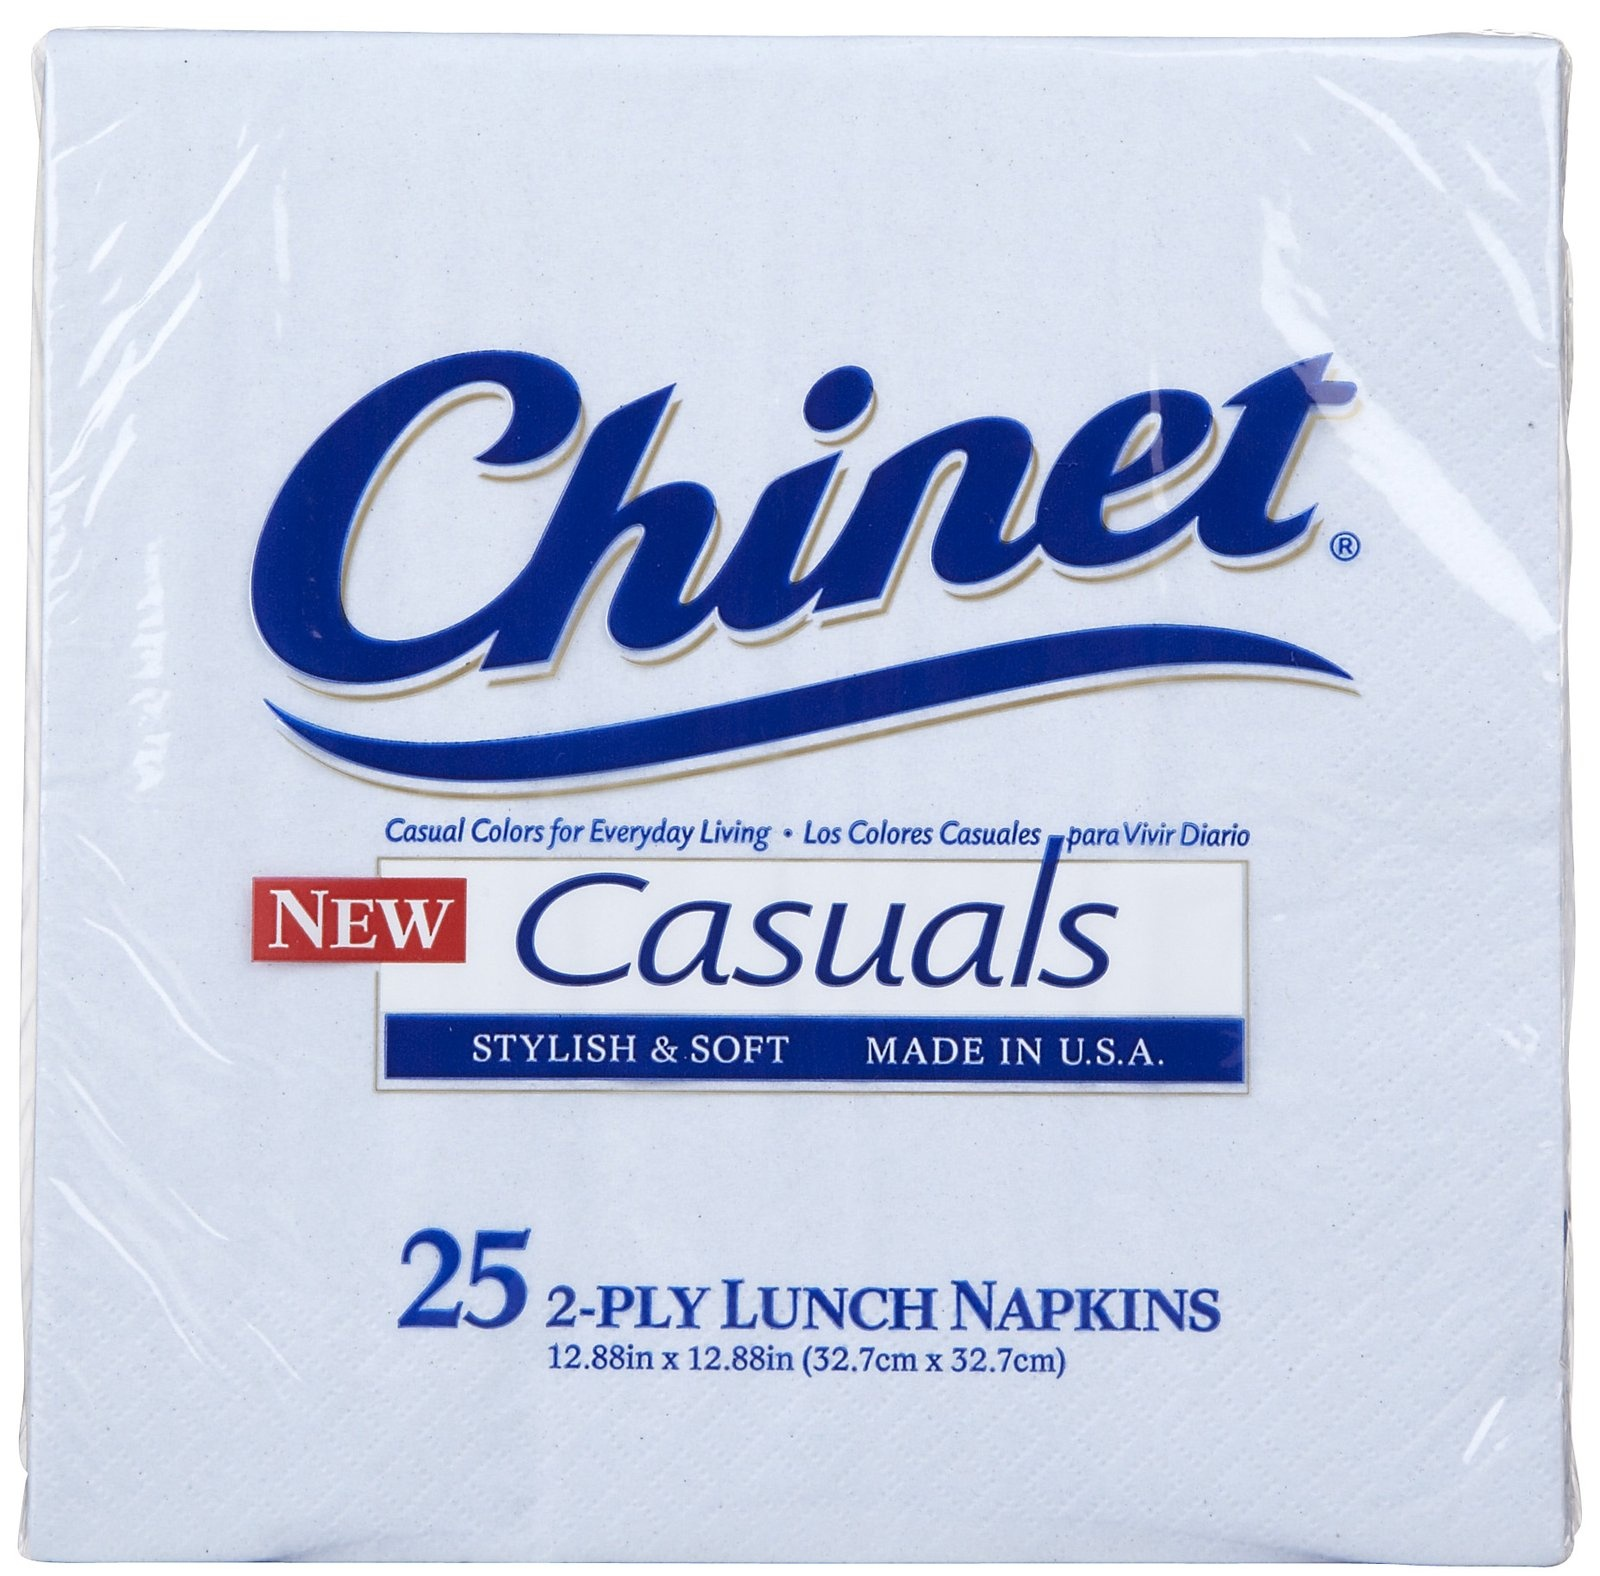 Free Chinet Napkins At Ocean State Job Lot! | Coupon Karma - Free Printable Chinet Coupons